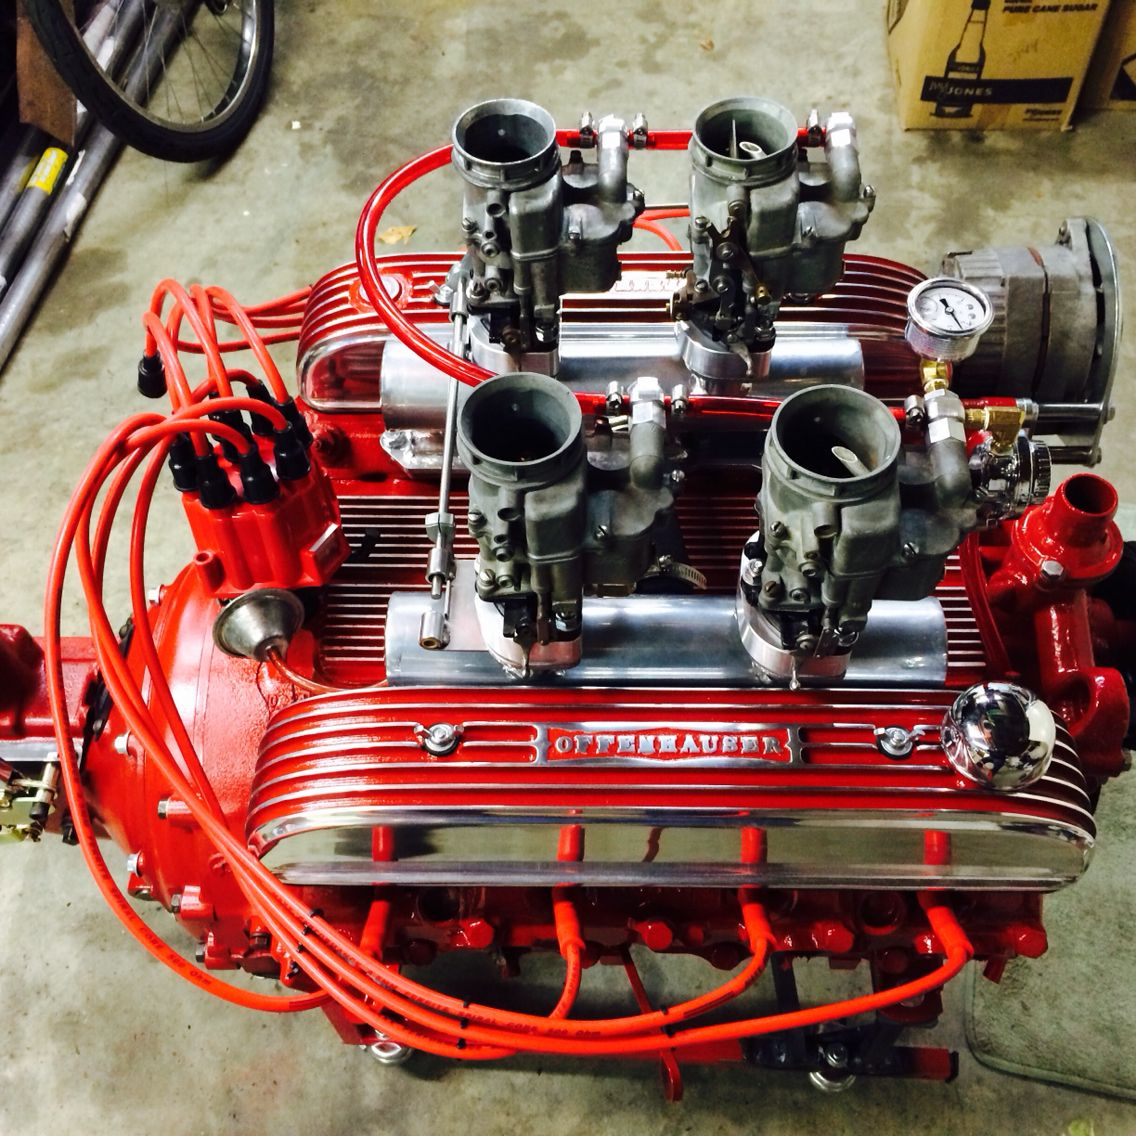 401 Nailhead | Buick Nailhead | Motor engine, Buick nailhead